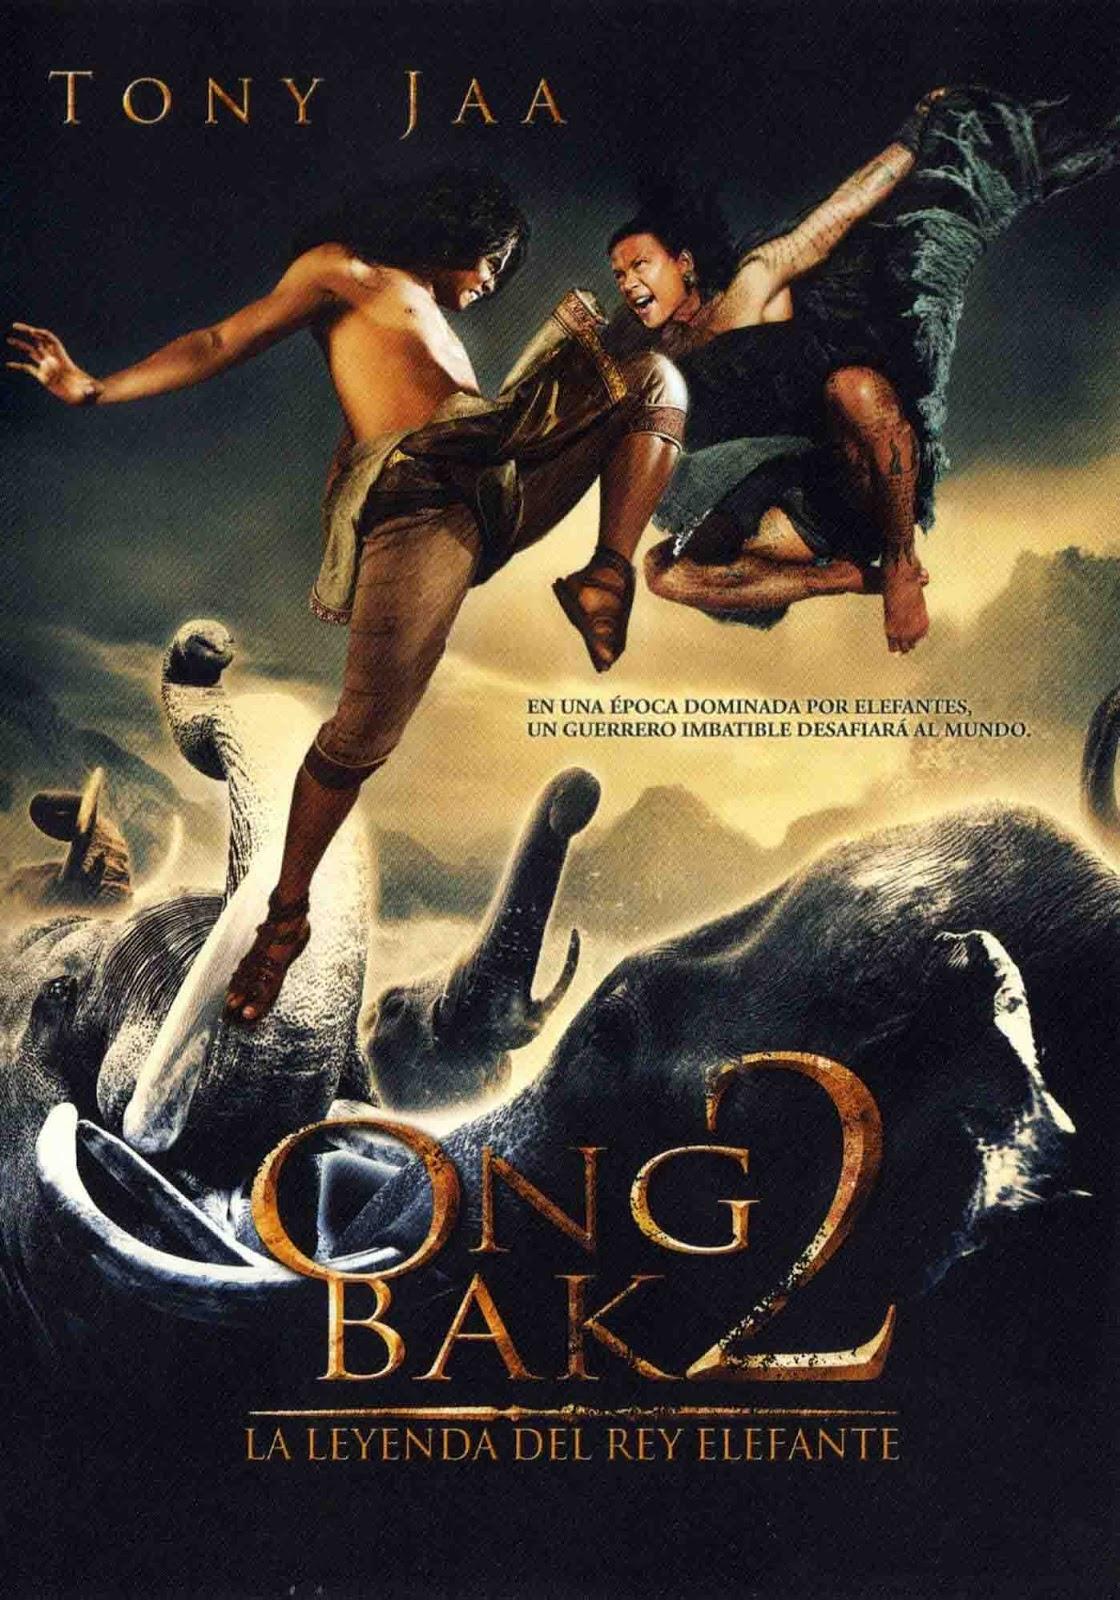 Ong-Bak 2 Torrent - Blu-ray Rip 1080p Dublado (2008)